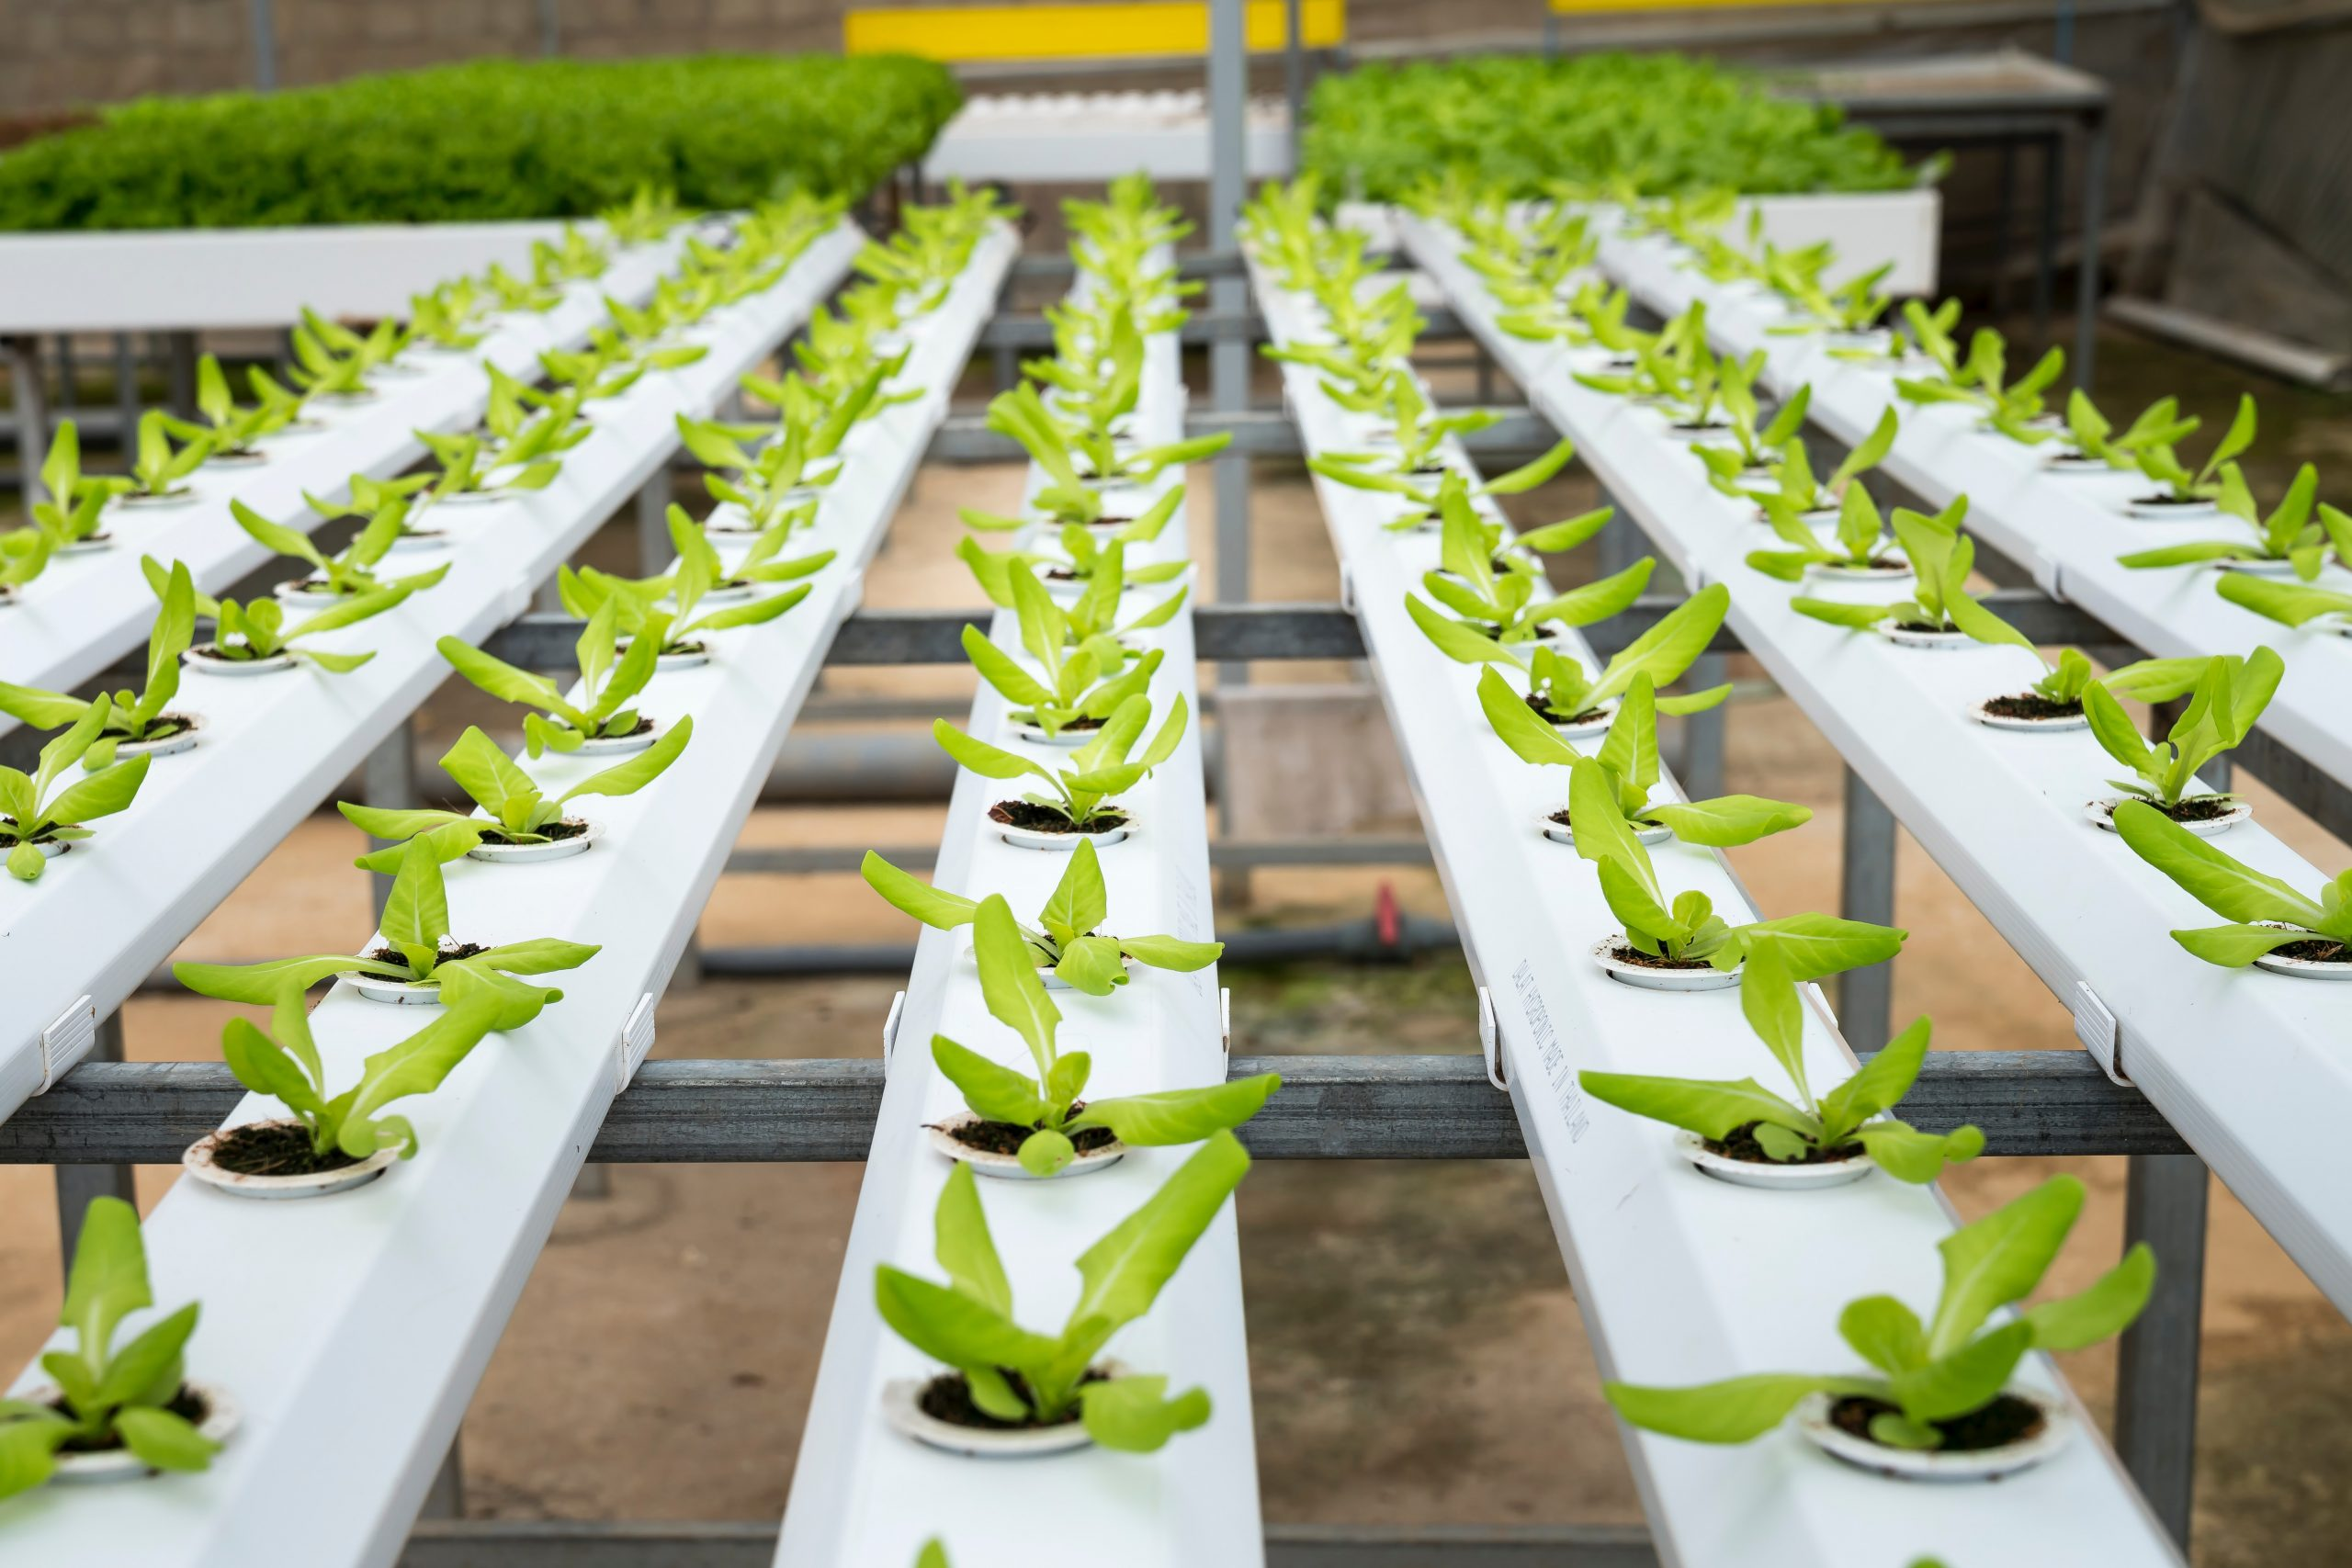 saplings inside farming